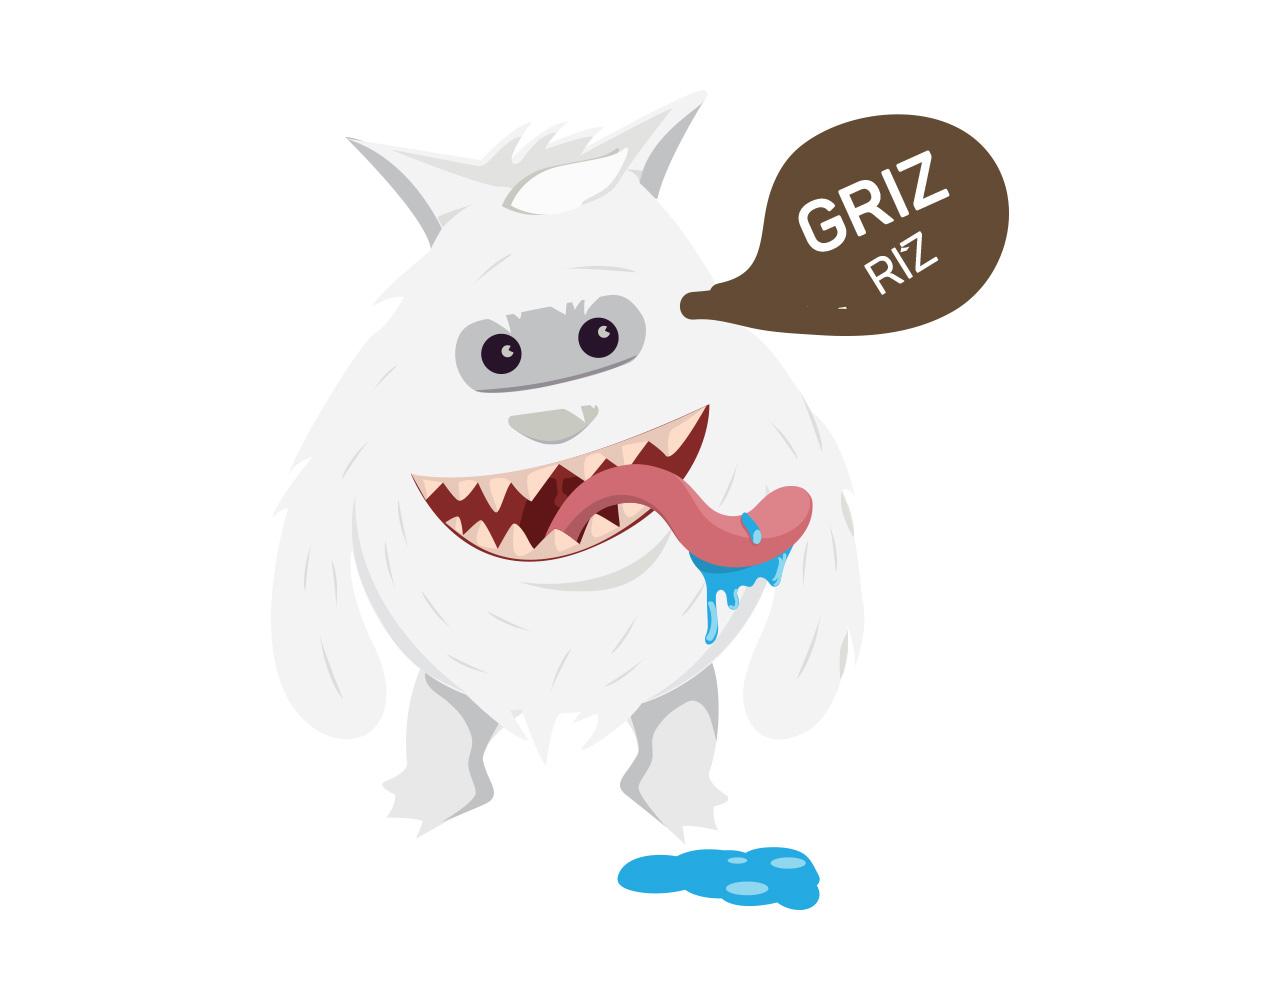 Grizetti-hero